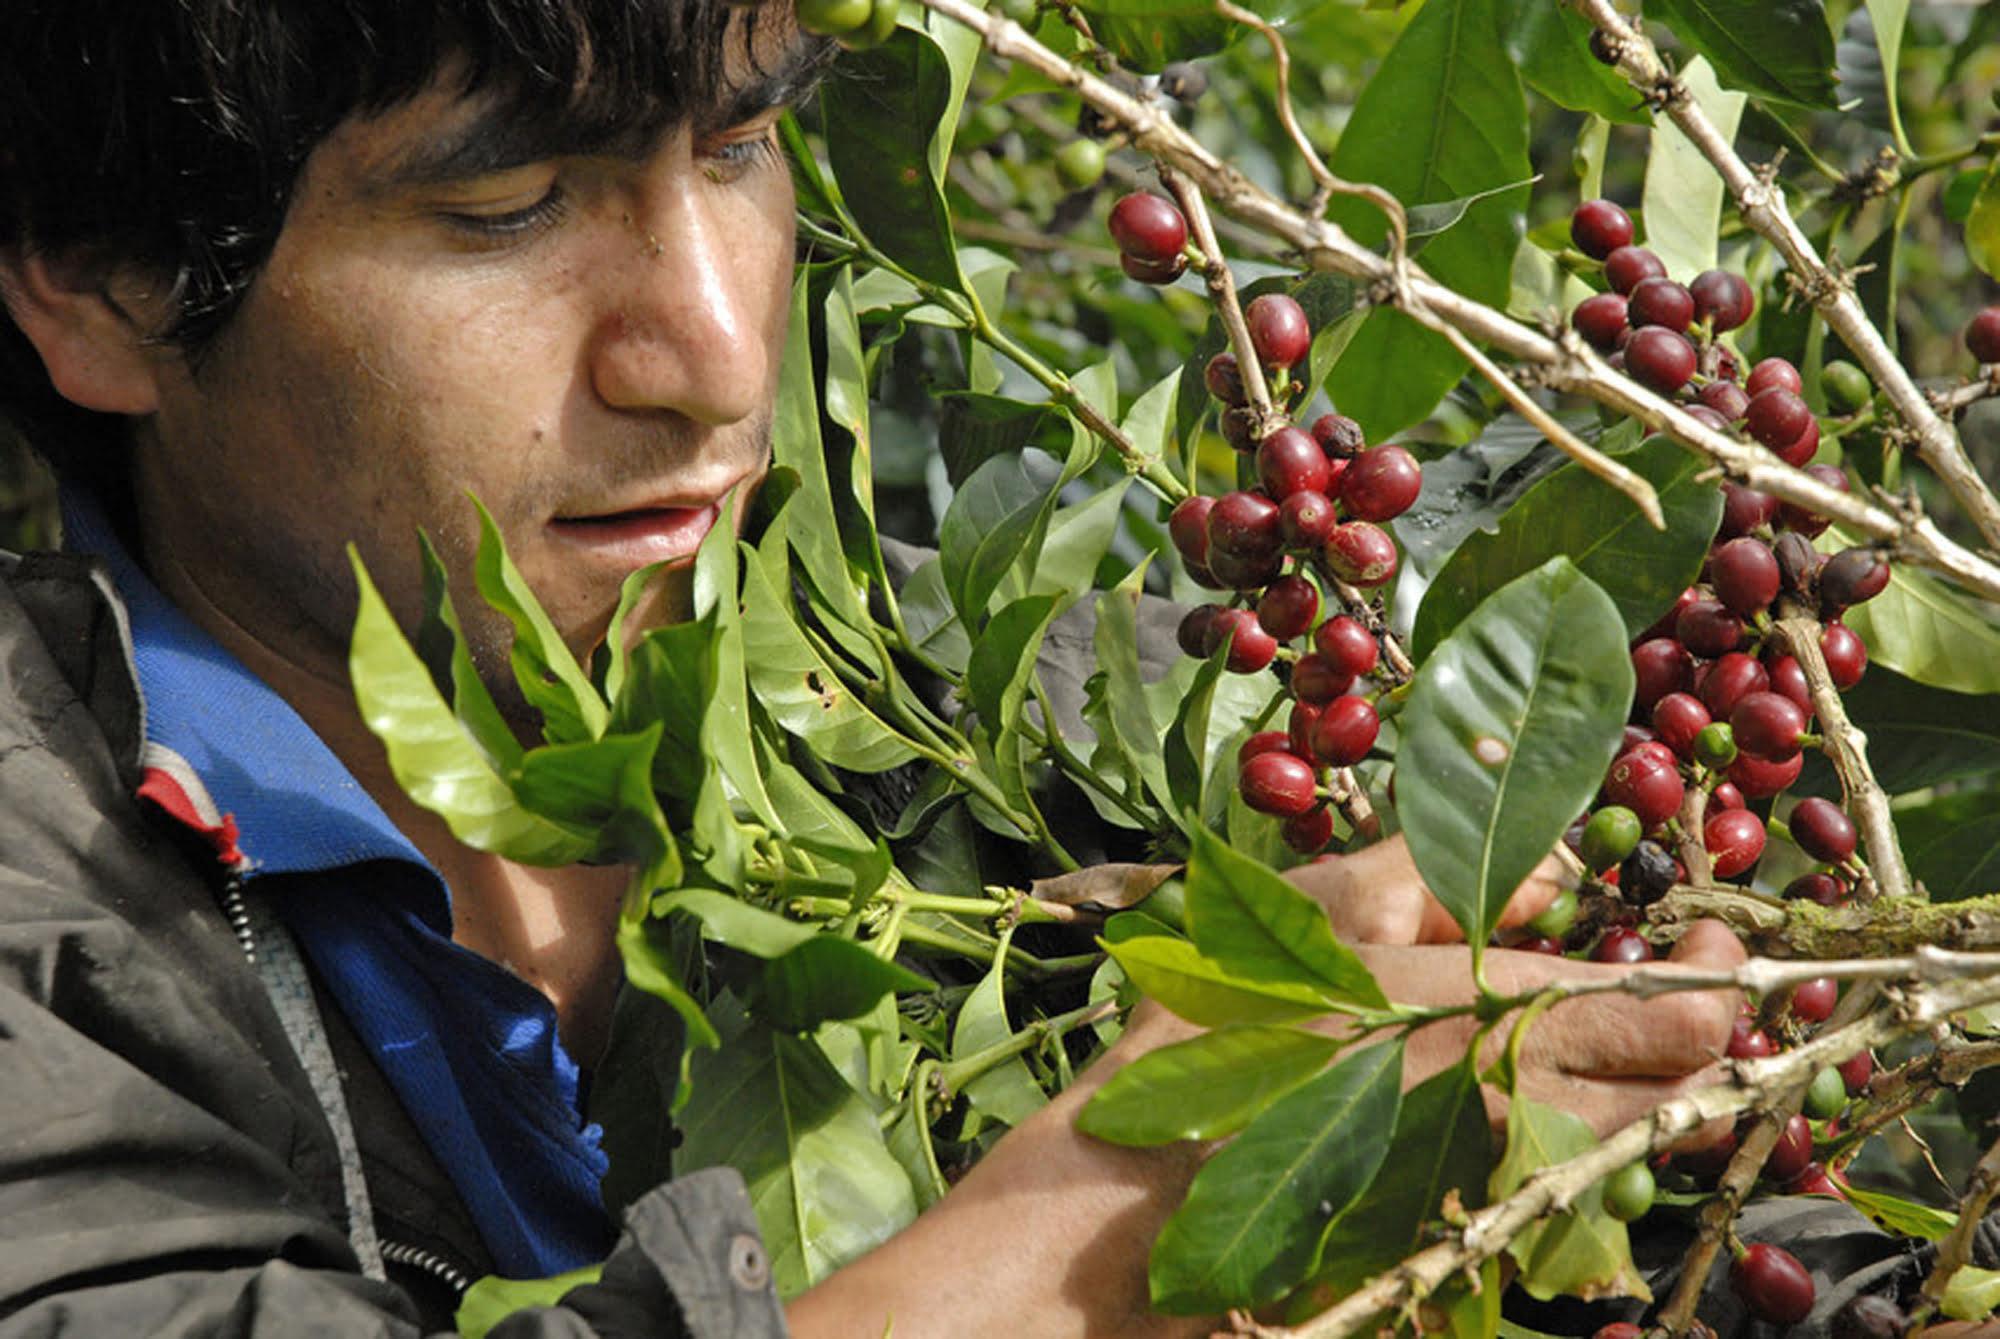 Sombrero unsere Max Havelaar Kaffees